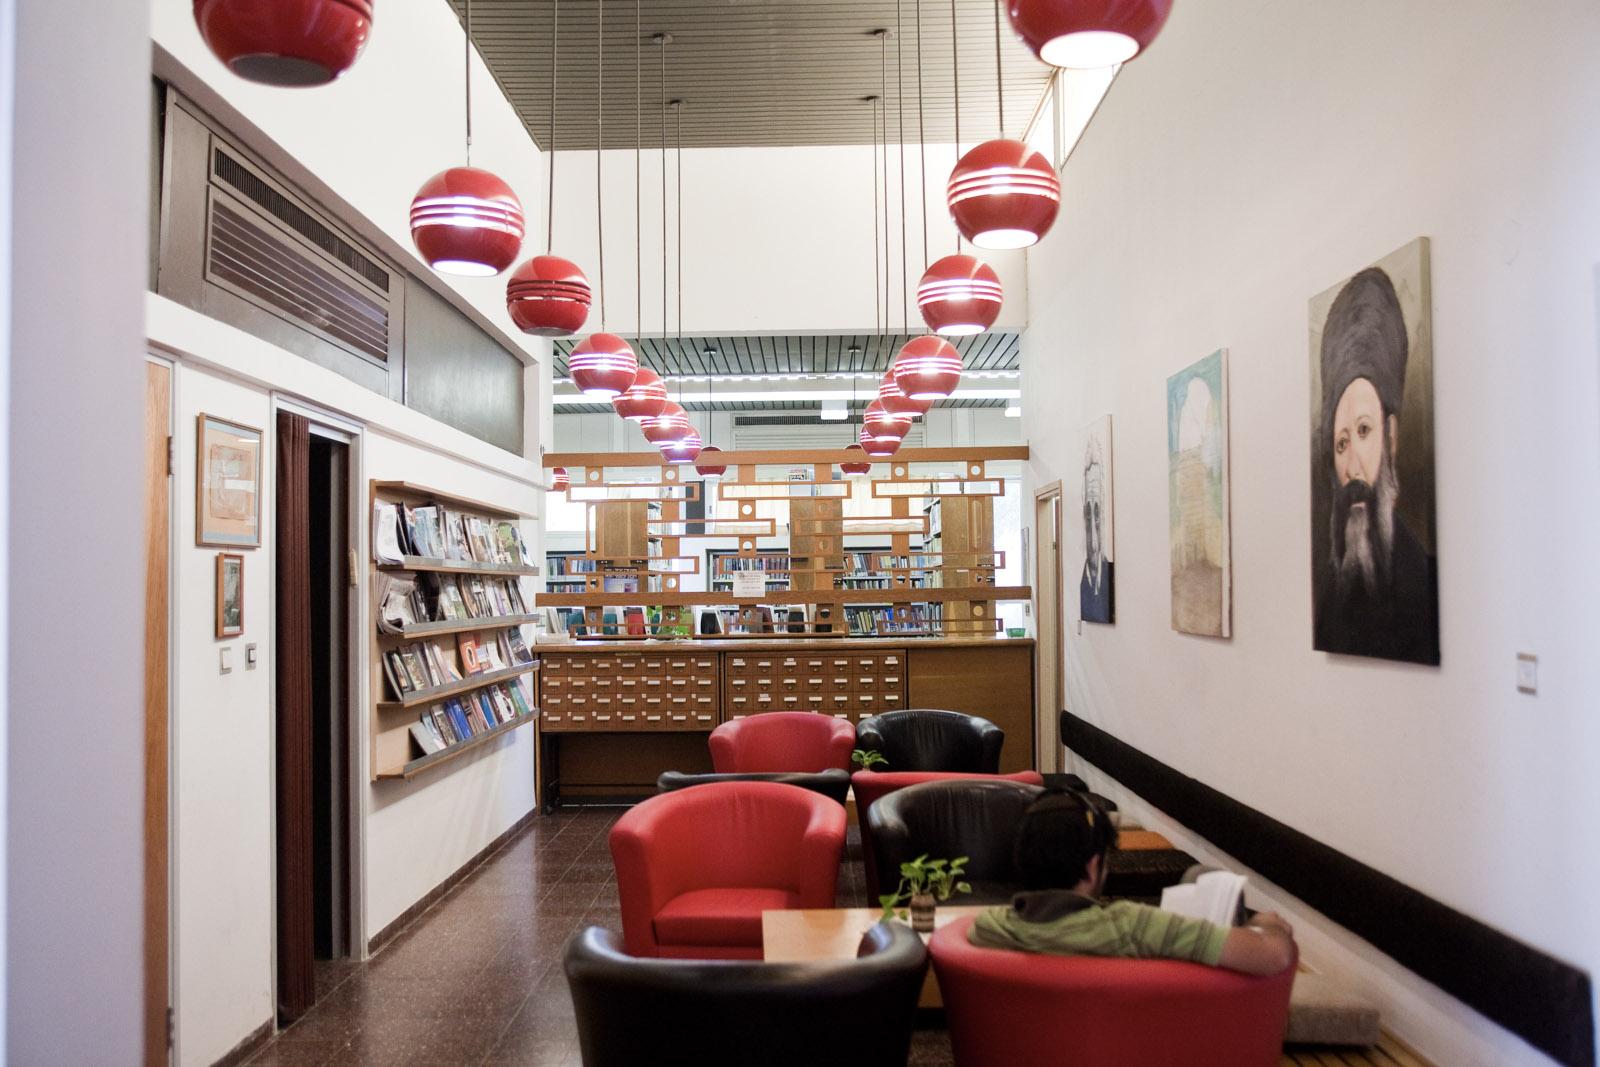 La bibliothèque du kibbutz Sde Eliyahu.